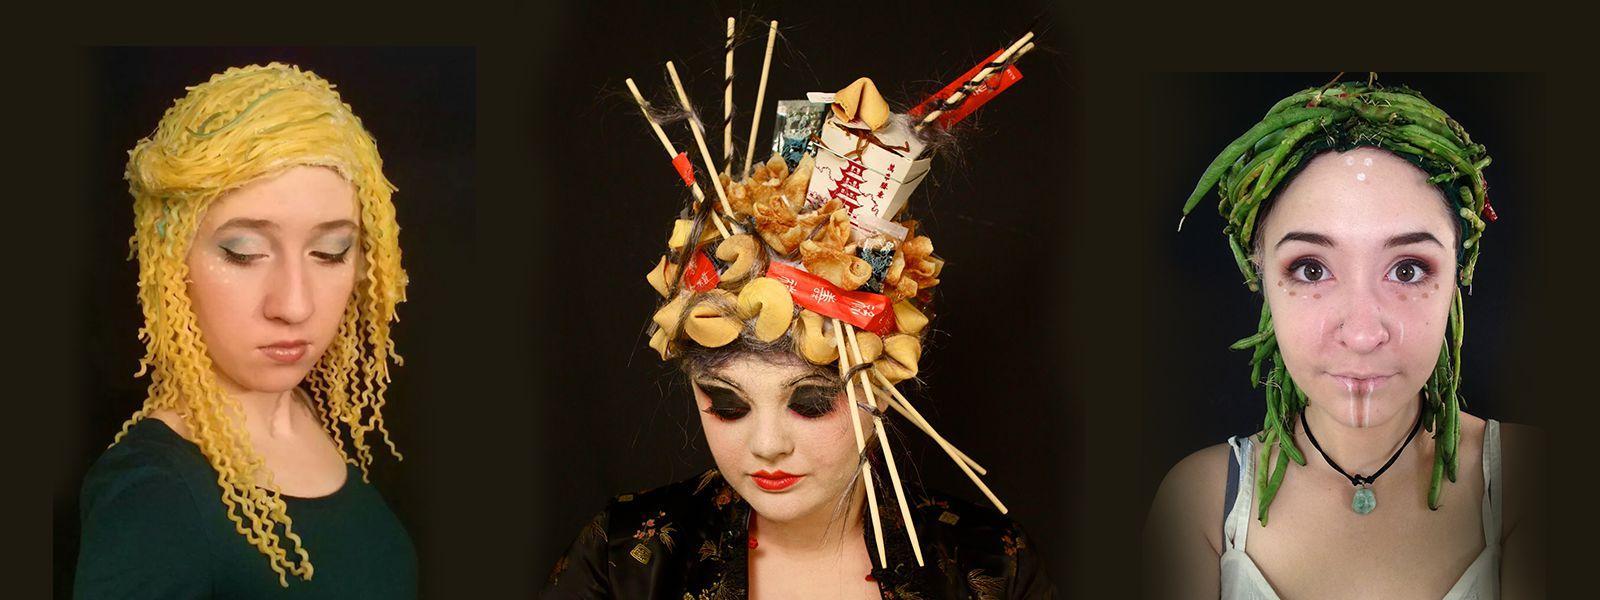 Undergraduate wig and makeup student work